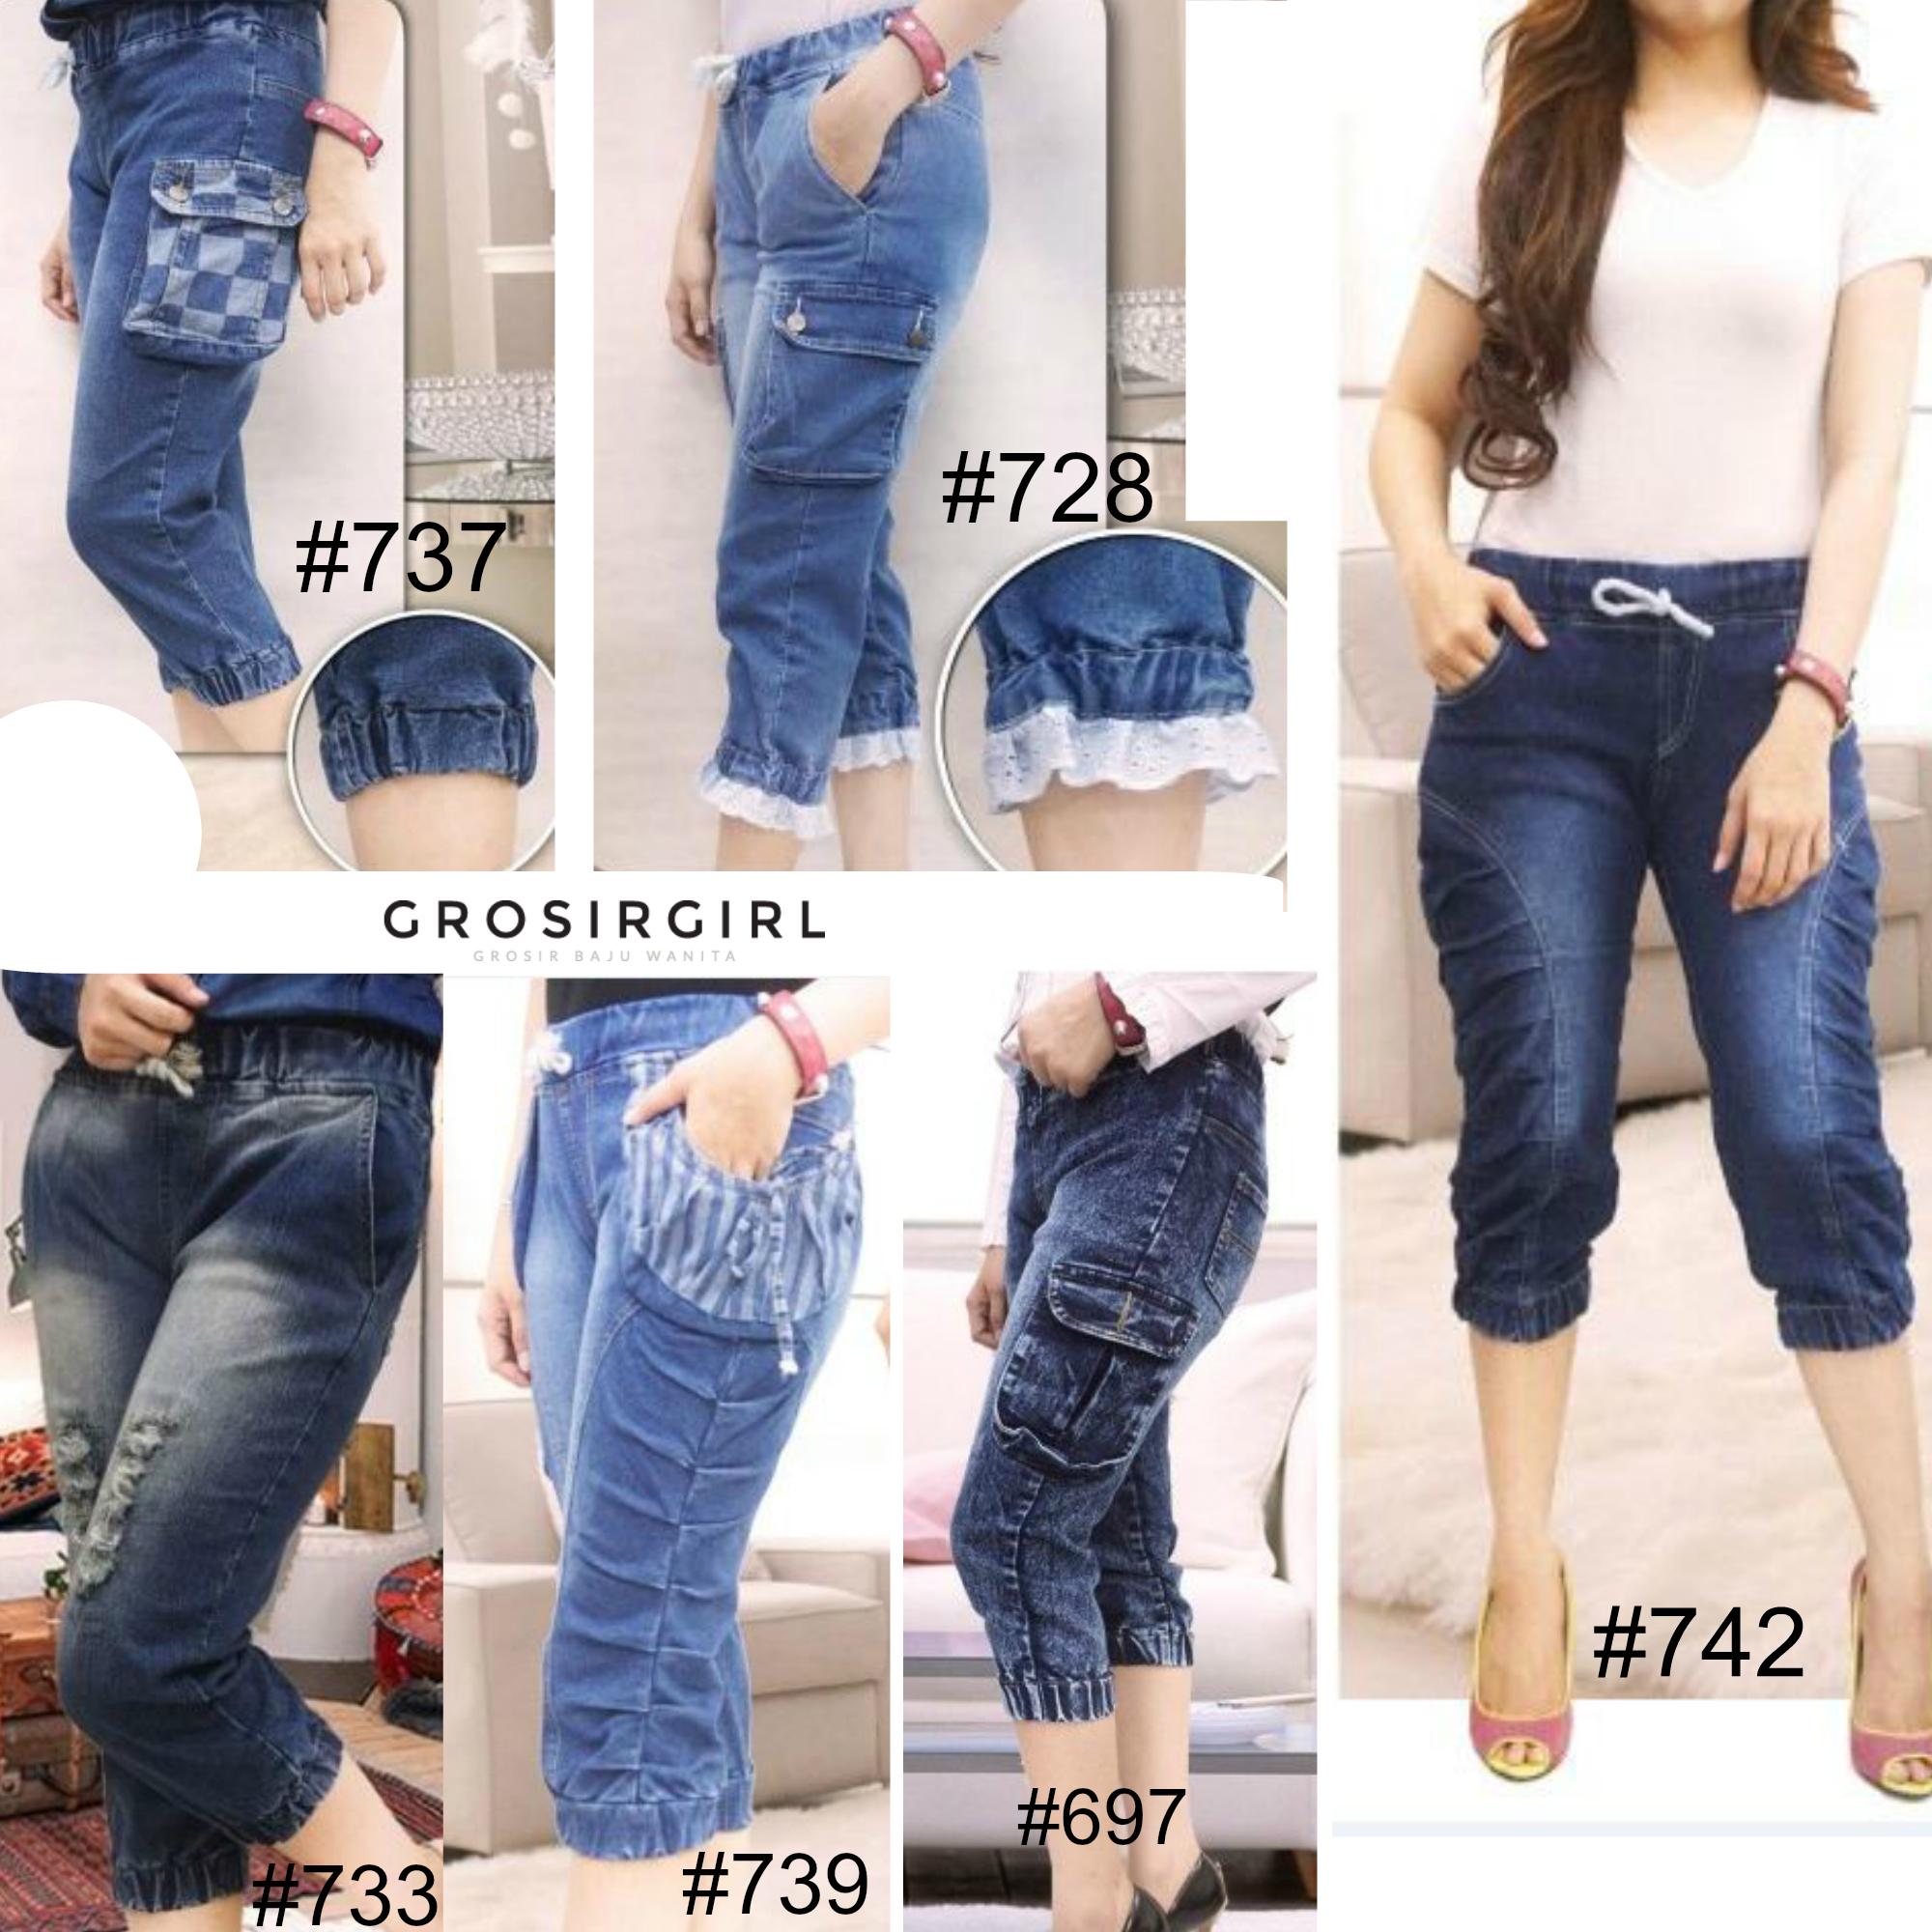 Celana Jeans Wanita Terbaru Tanah Abang Jaman Sekarang Model Baju Big Size Jual Jogger 7 8 Uk Standard Jumbo Xl 2xl